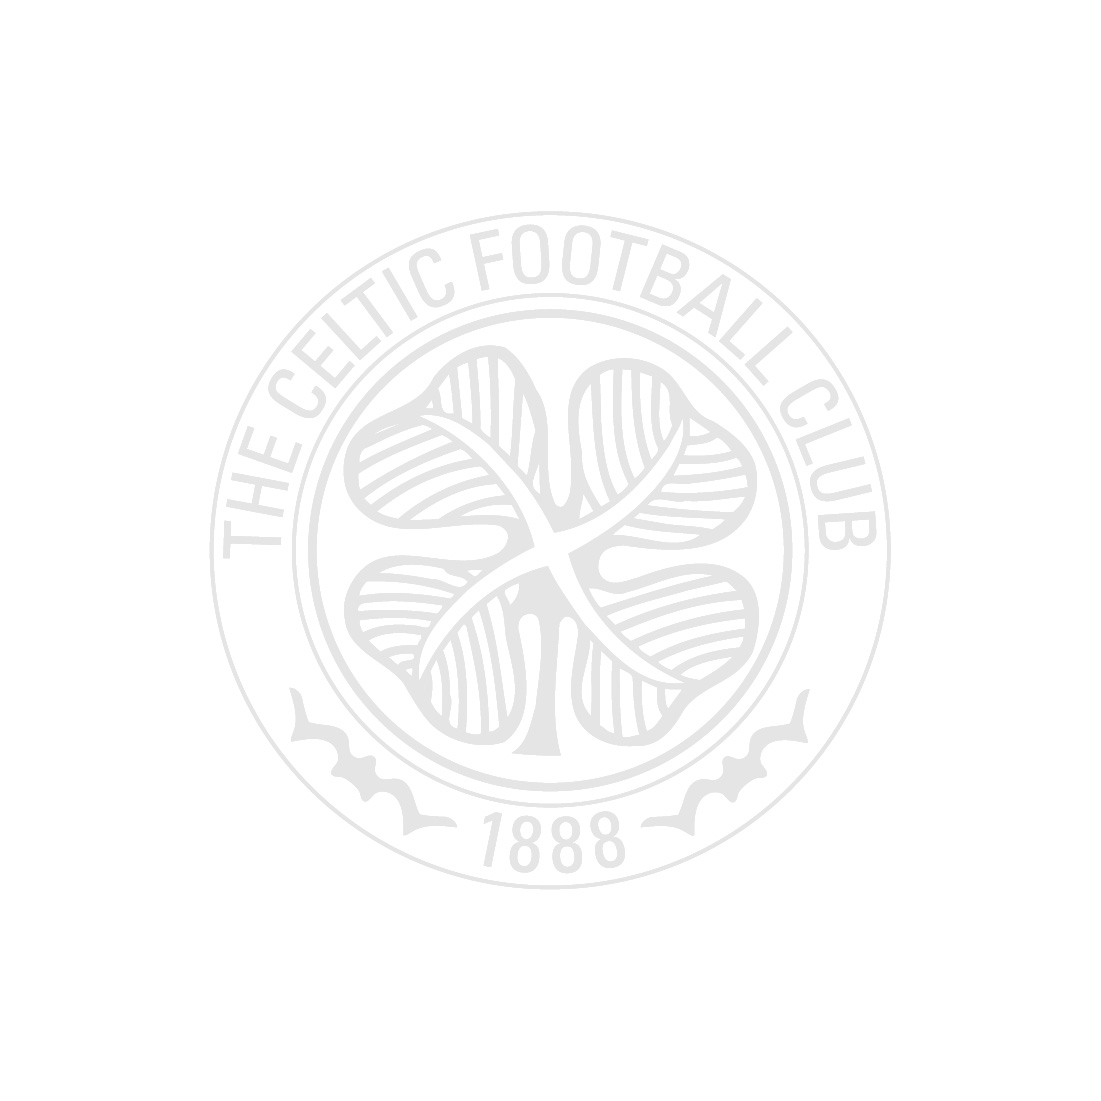 Celtic Champions 2018 Seven T-shirt